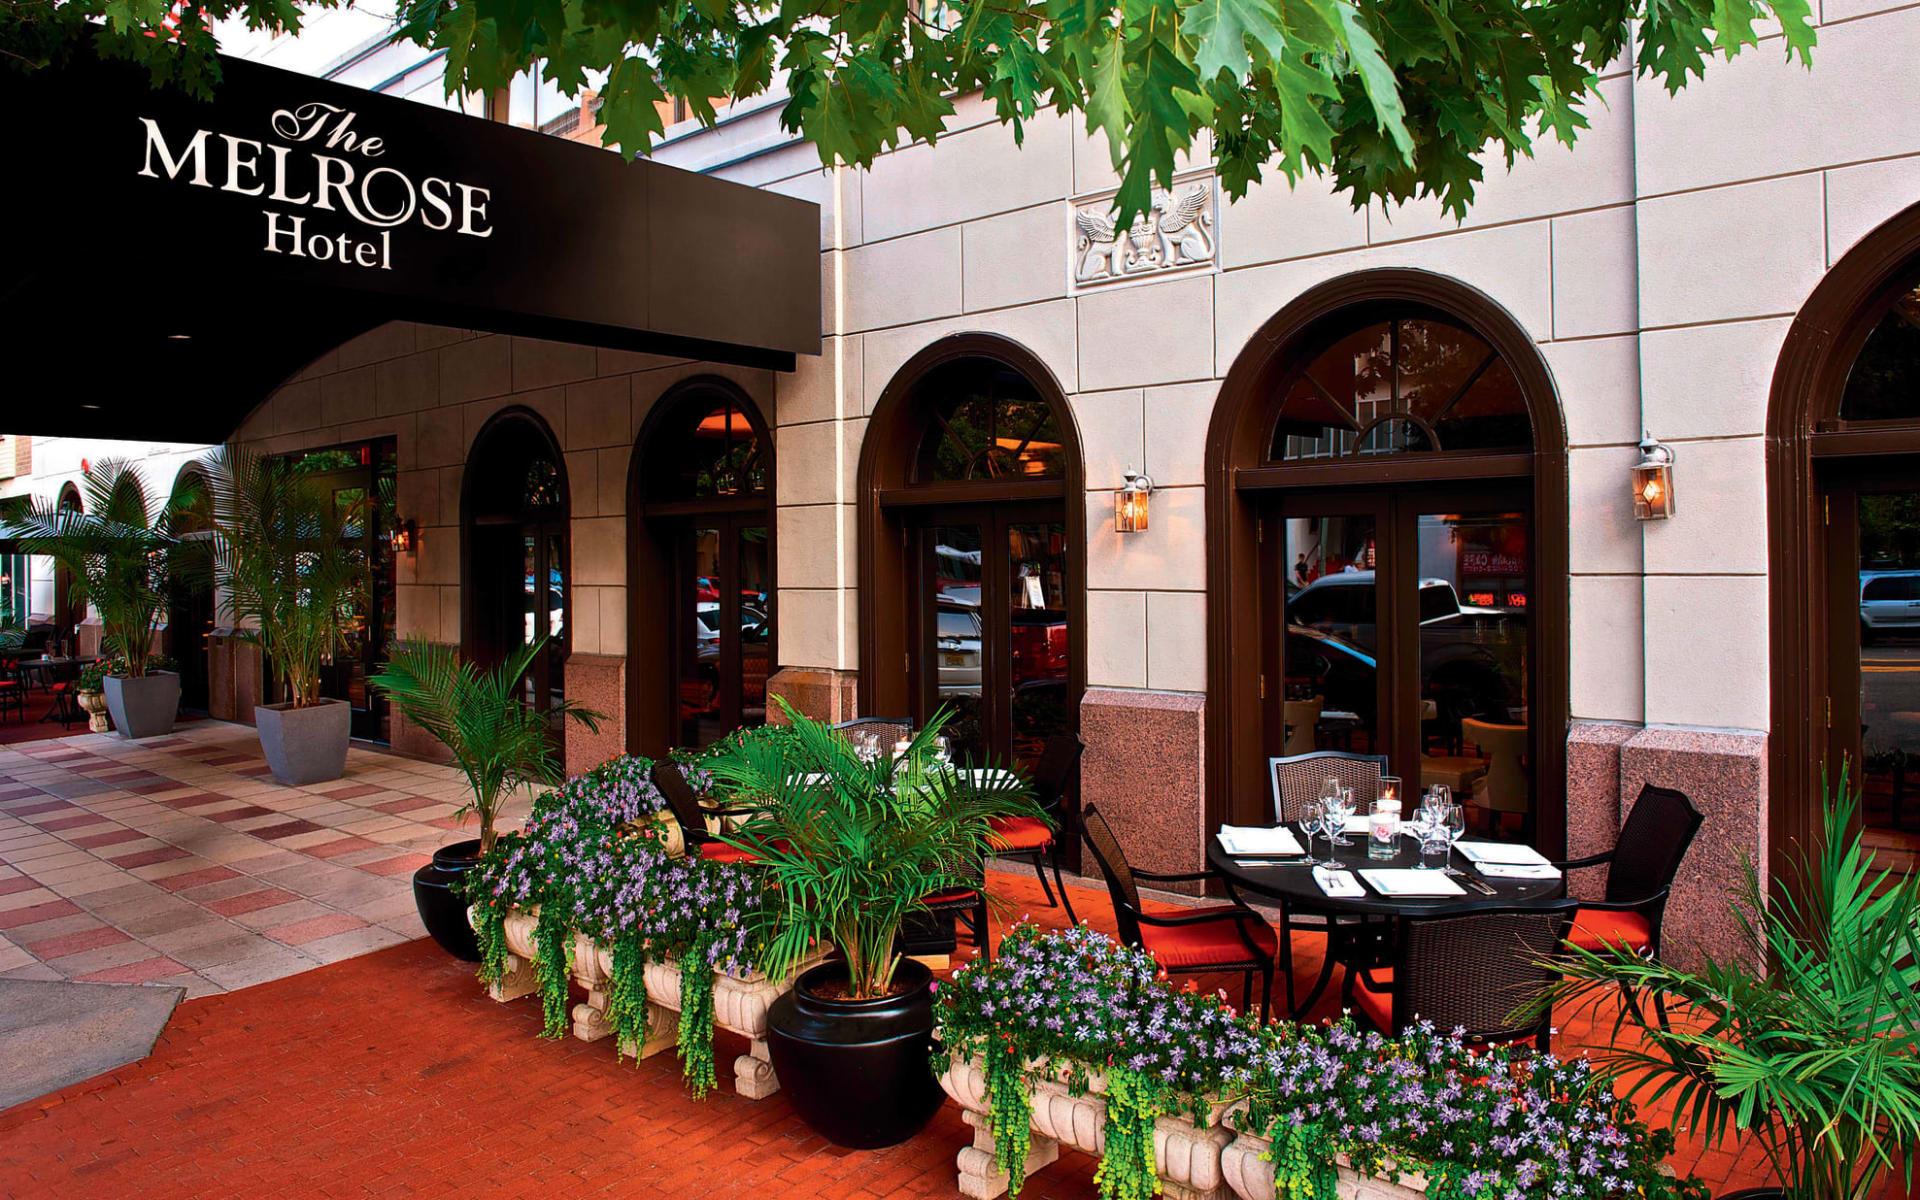 Melrose Georgetown Hotel in Washington D.C.: facilities the melrose georgetown hoteleingang